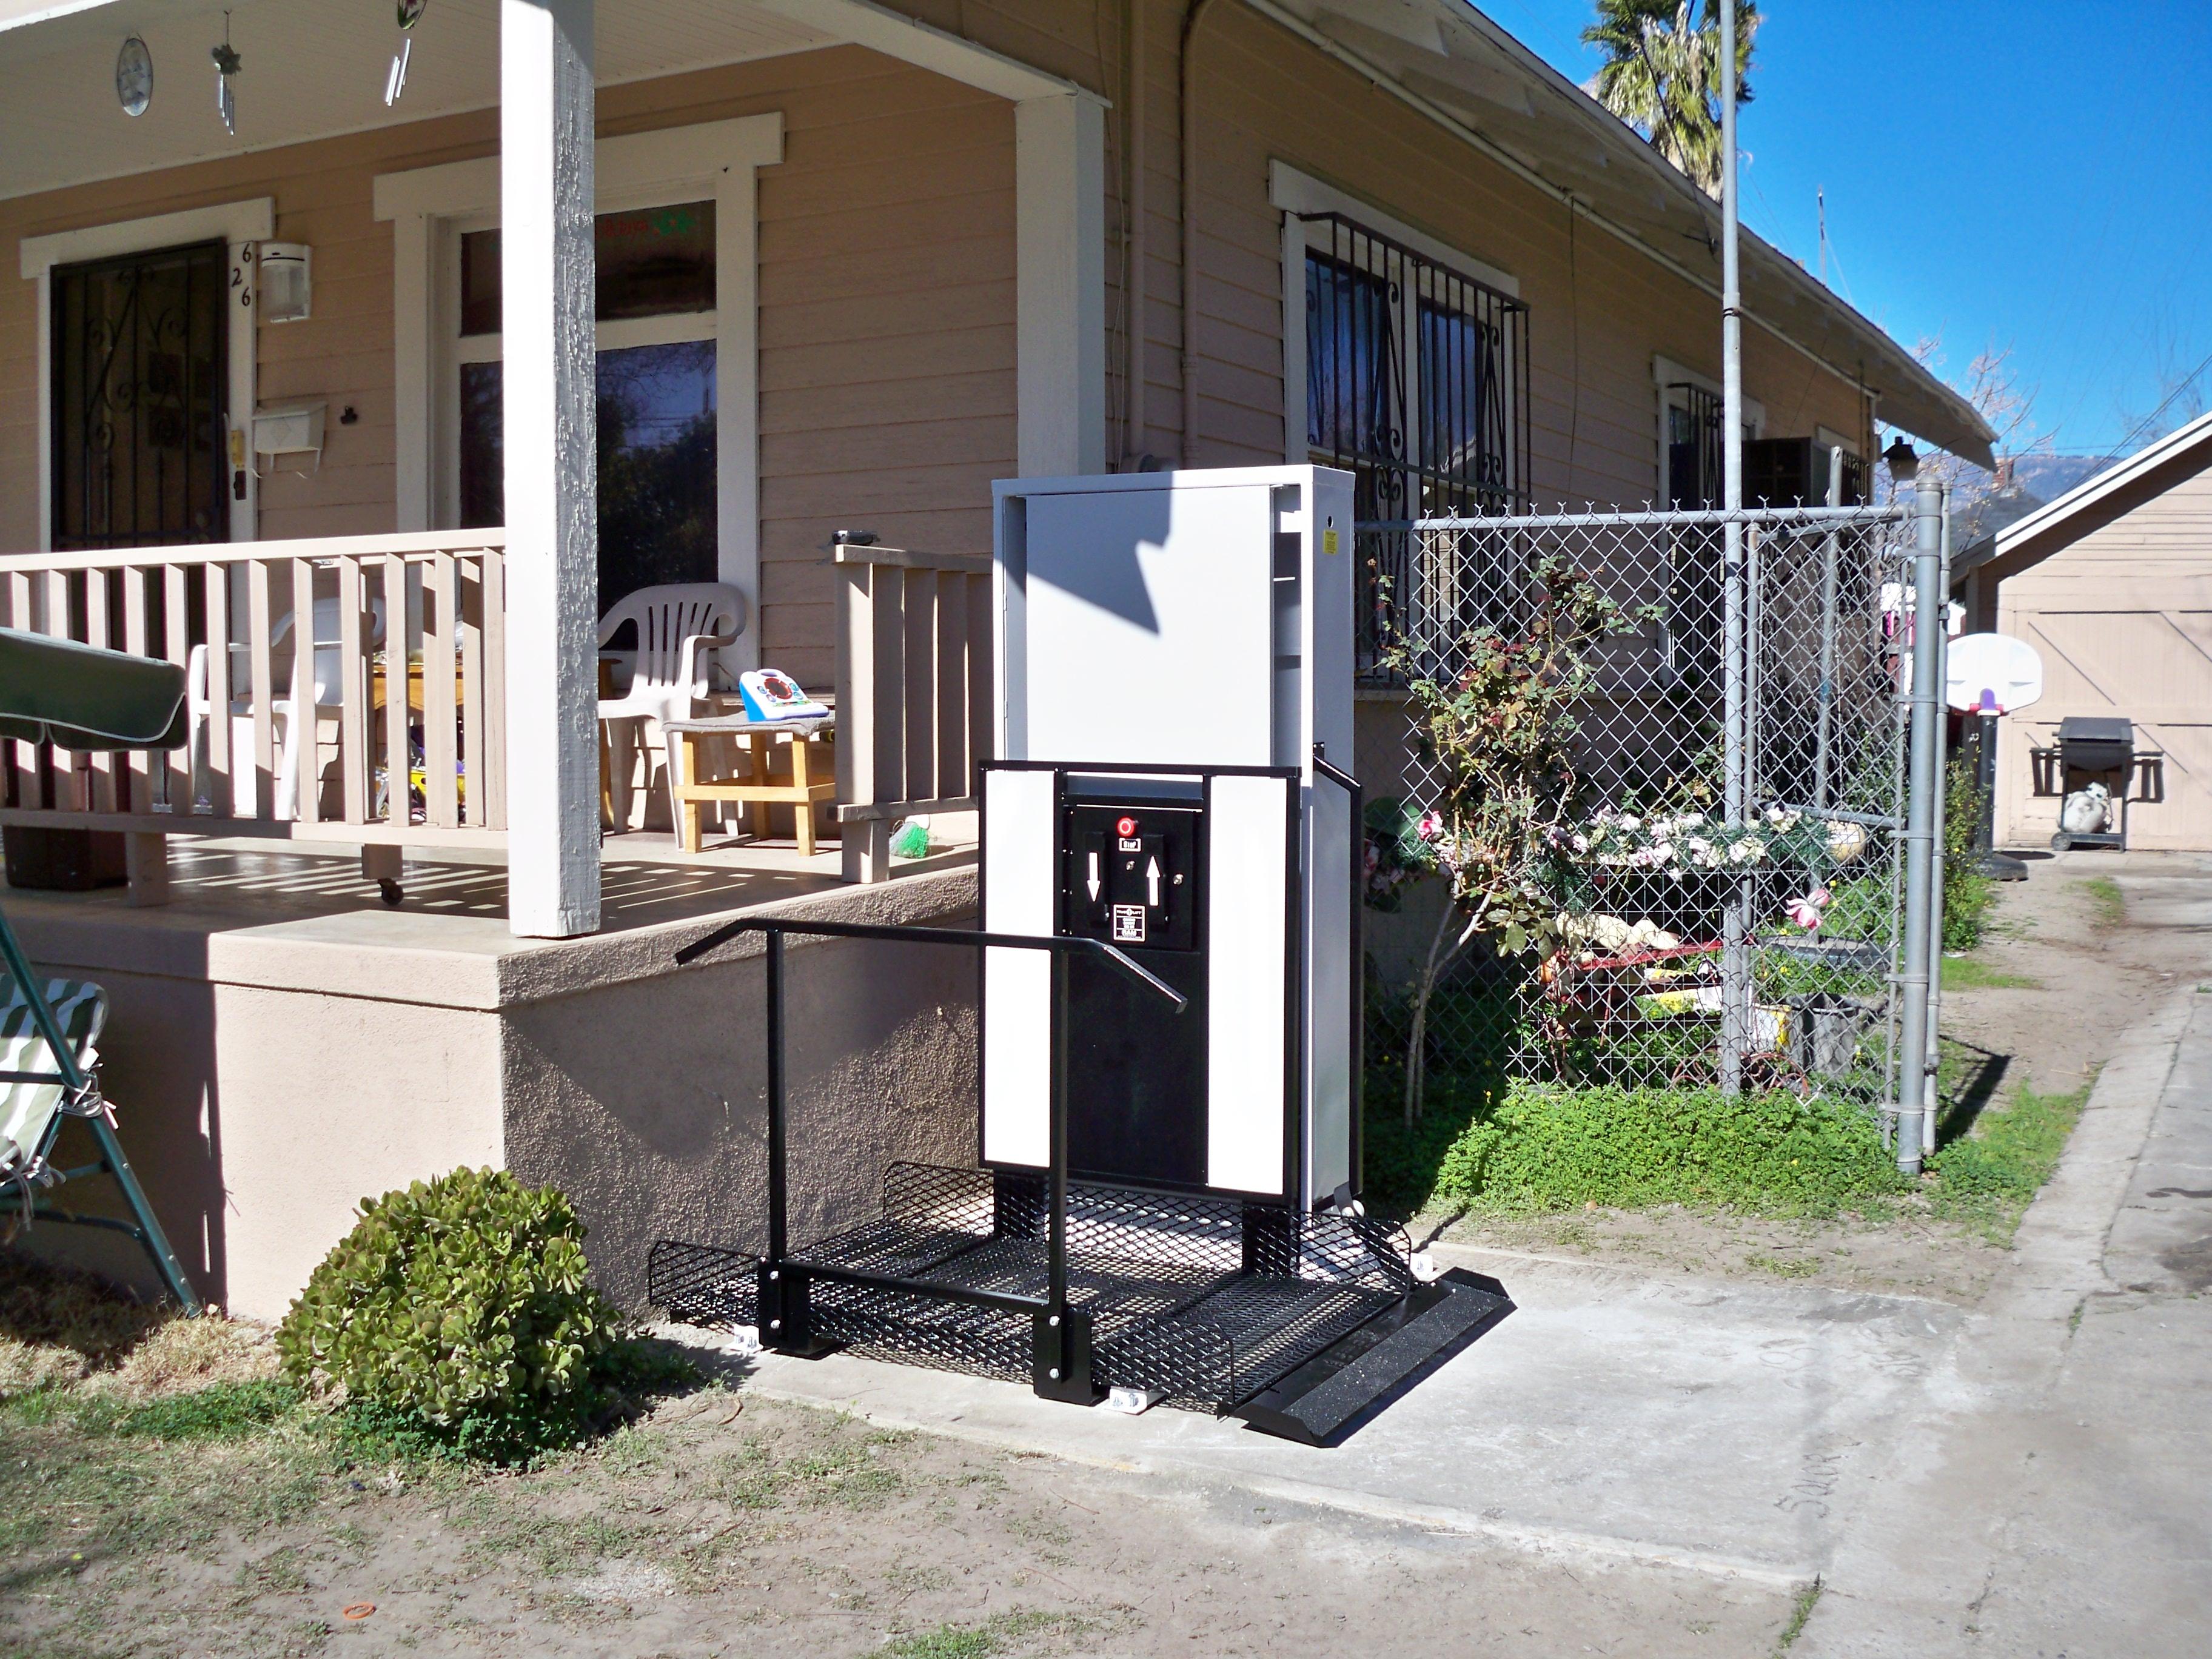 ada vpl home pl porch lift mac pin aka model vertical s